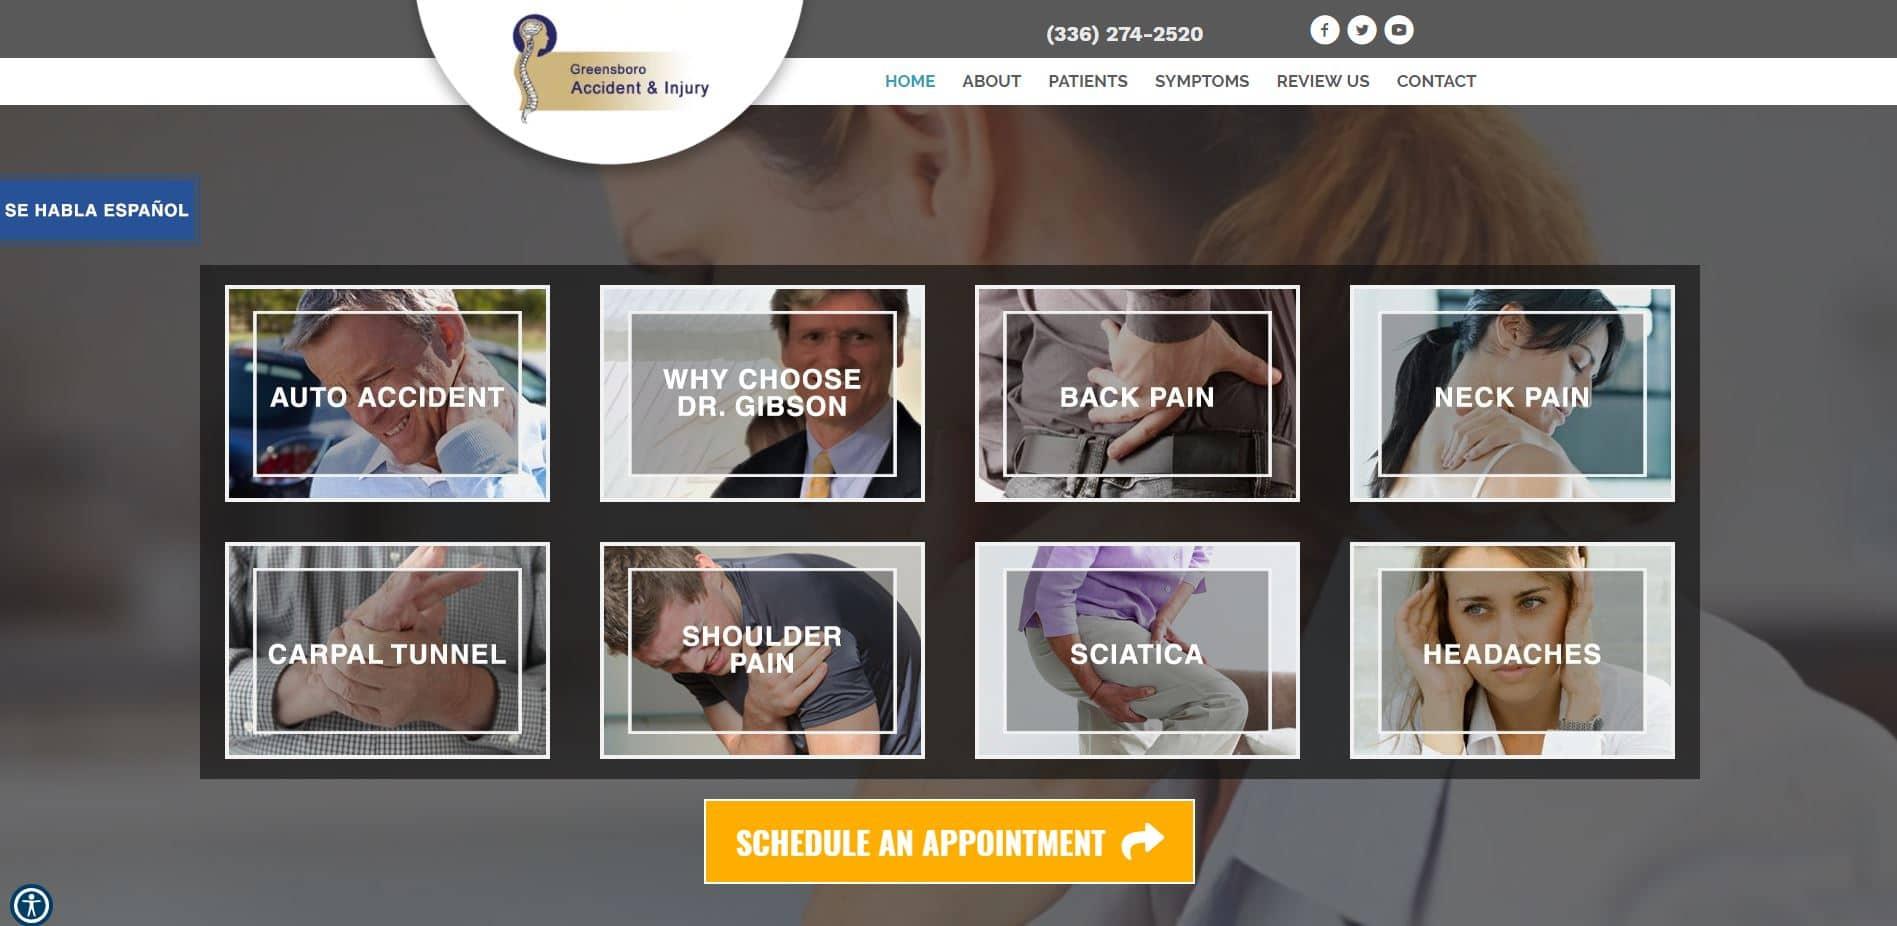 Chiropractor in Greensboro